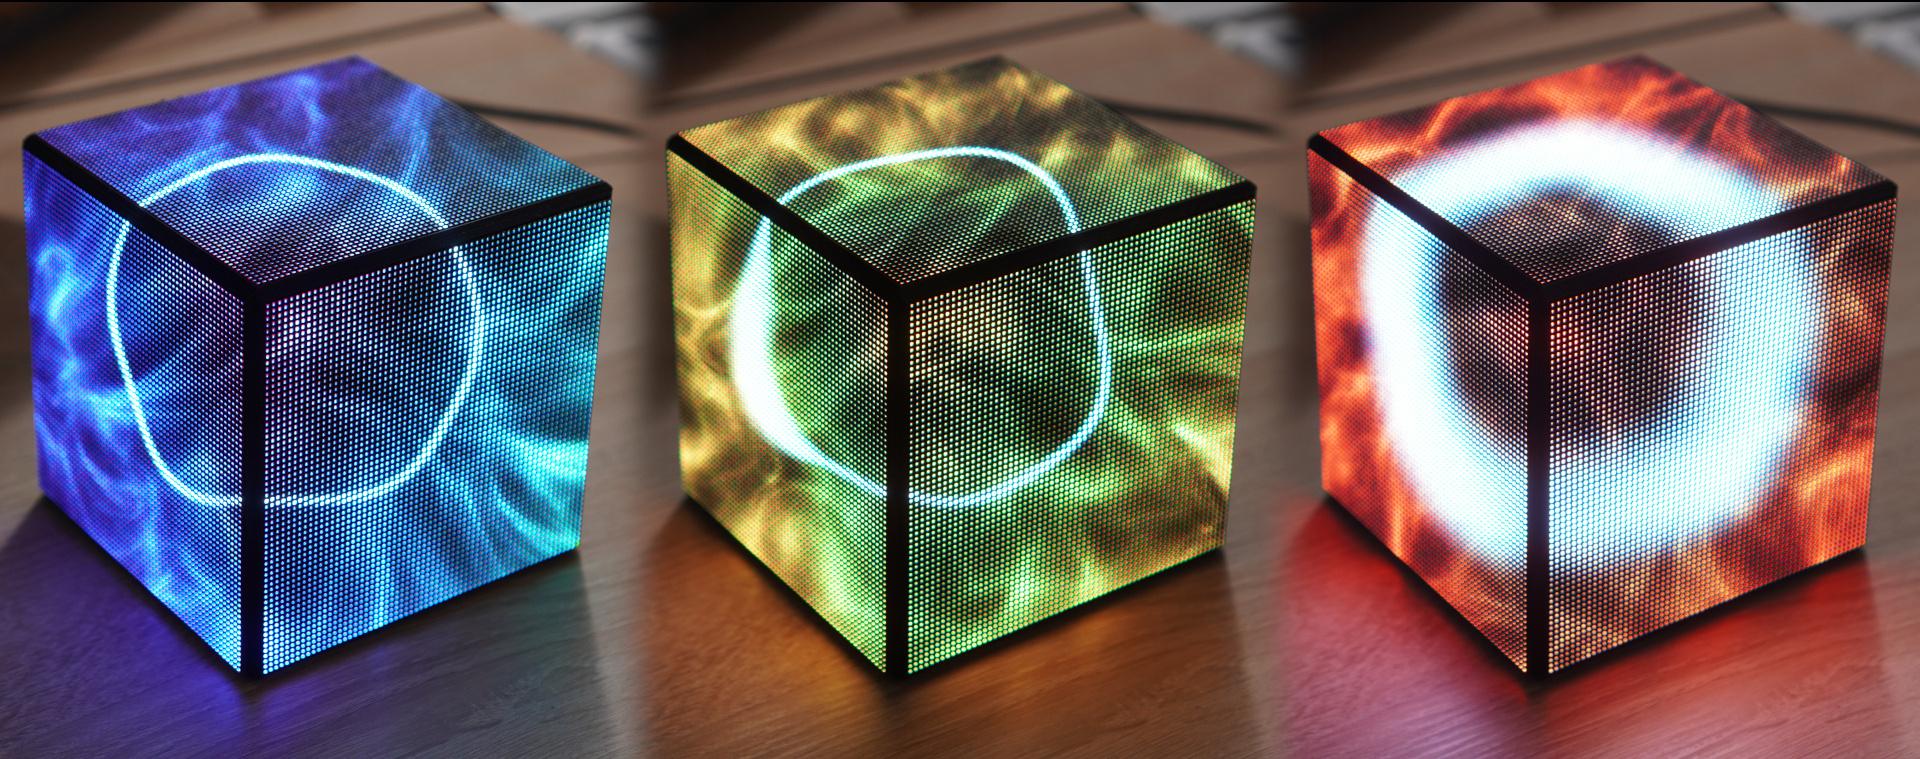 Cubo RGB LED para ver el uso de tu CPU con Raspberry Pi